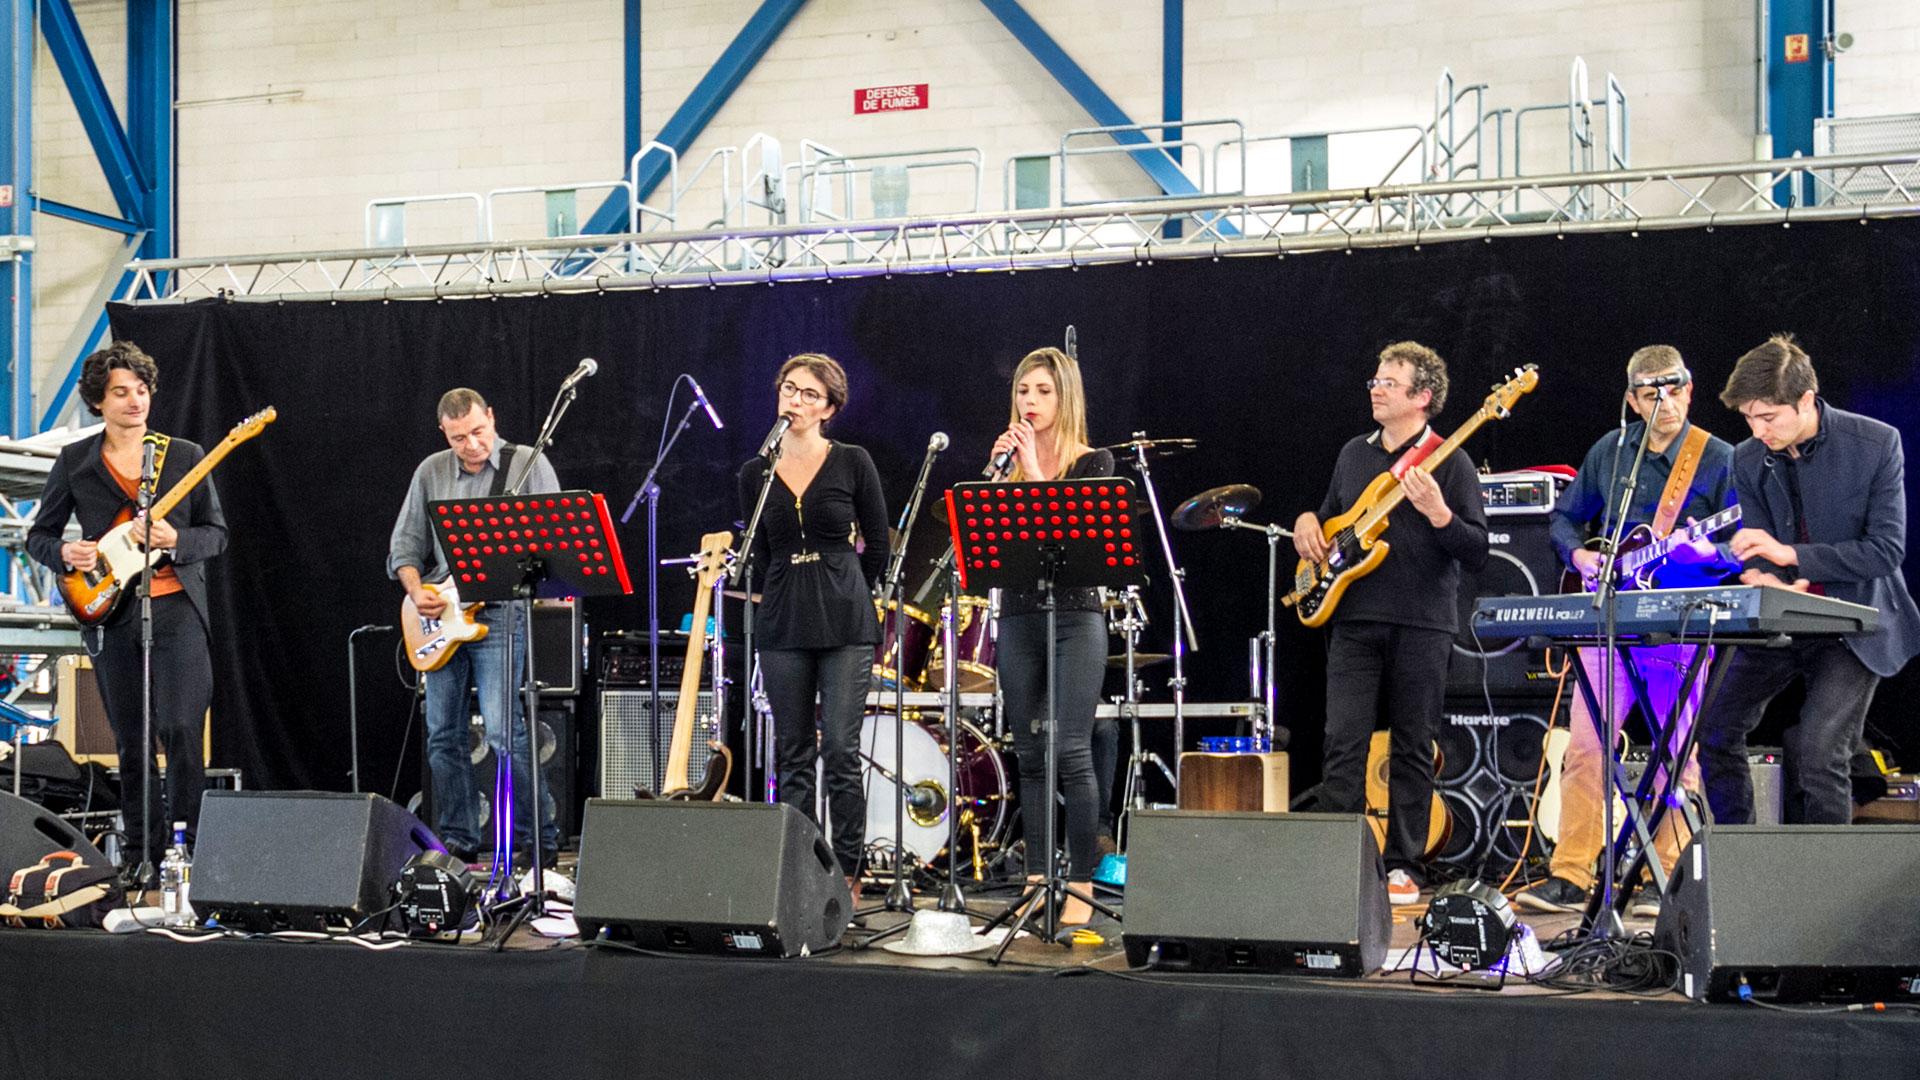 Orchestre Sabena technics Saint Eloi